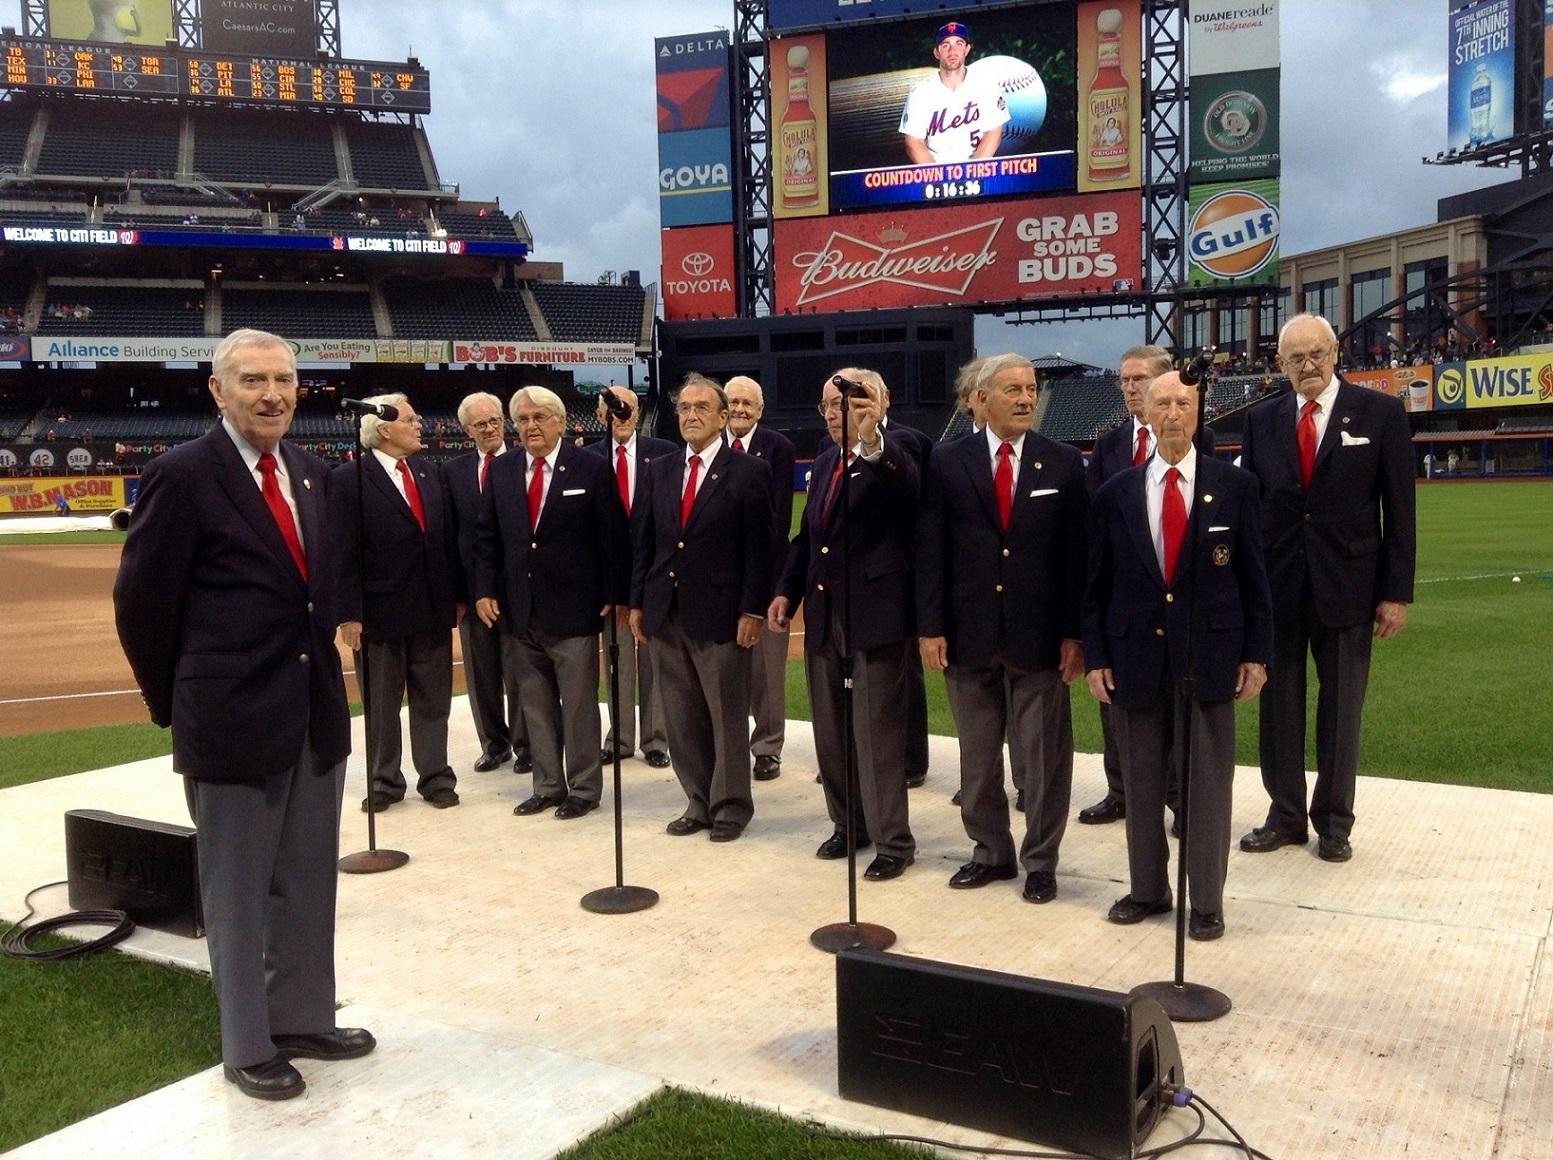 Performance at Citi Field - National Anthem